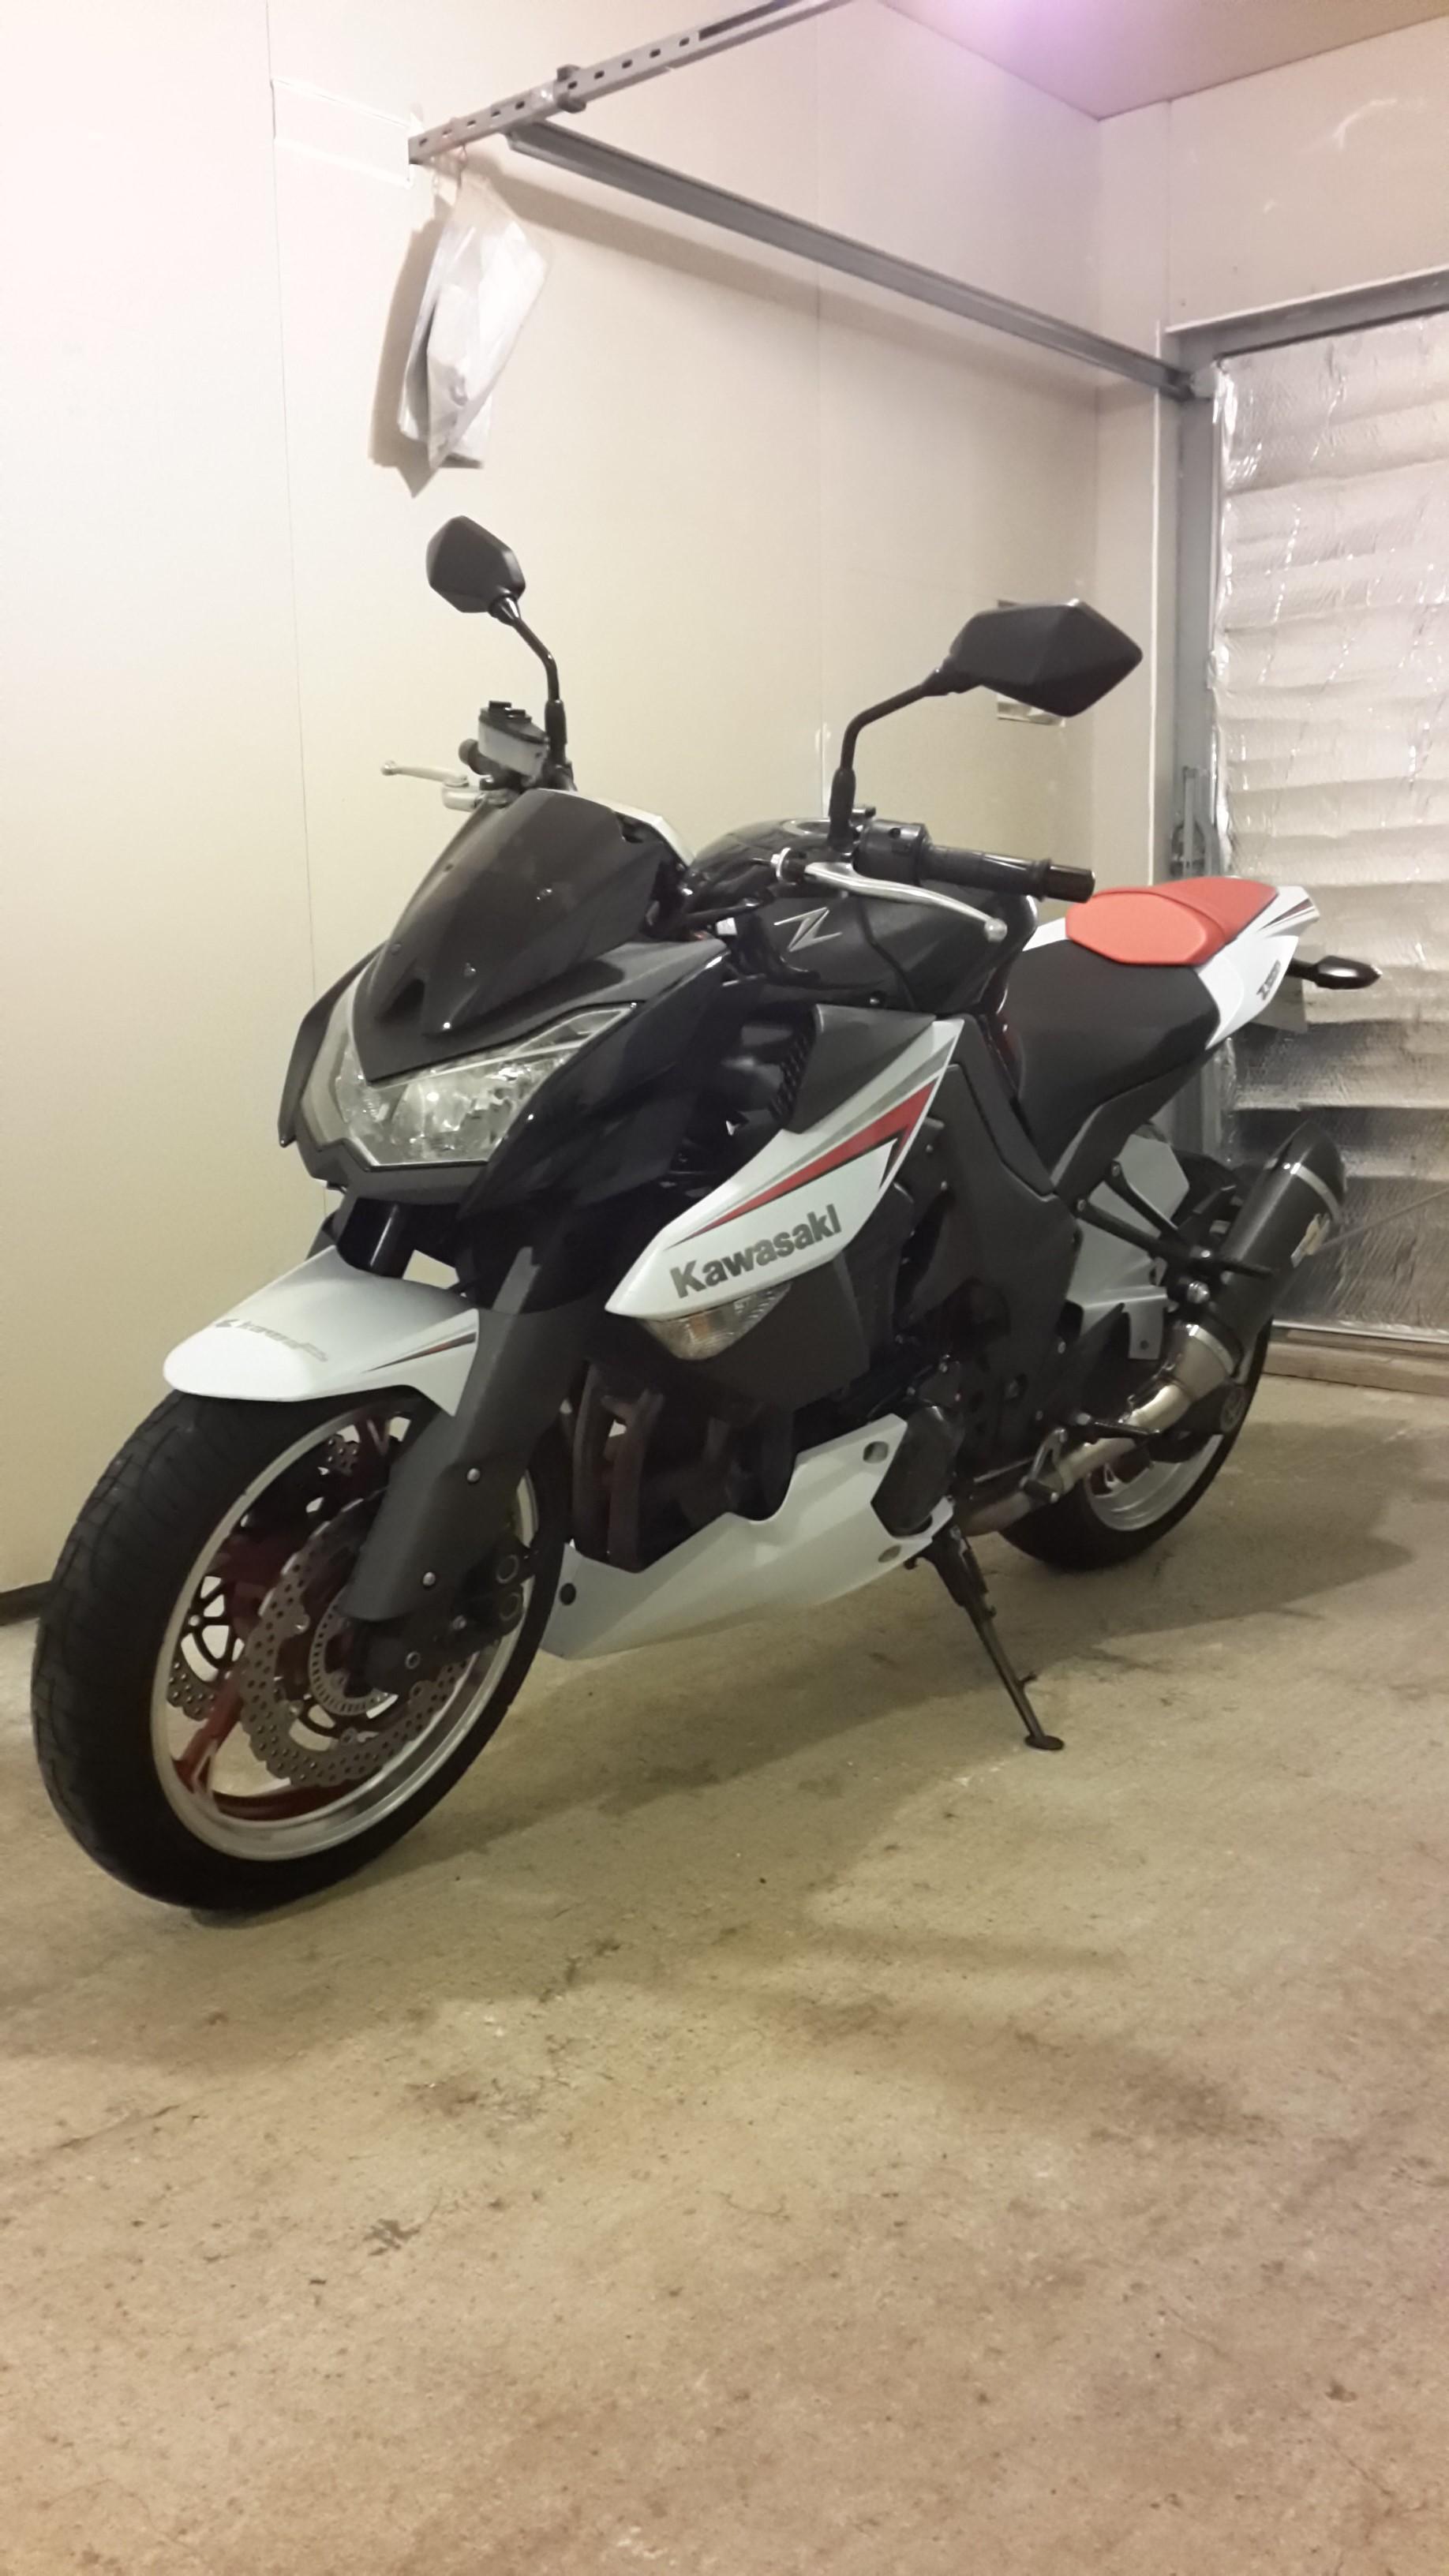 [VENDU] Z1000 ABS 2013 edition speciale 151126052601960860